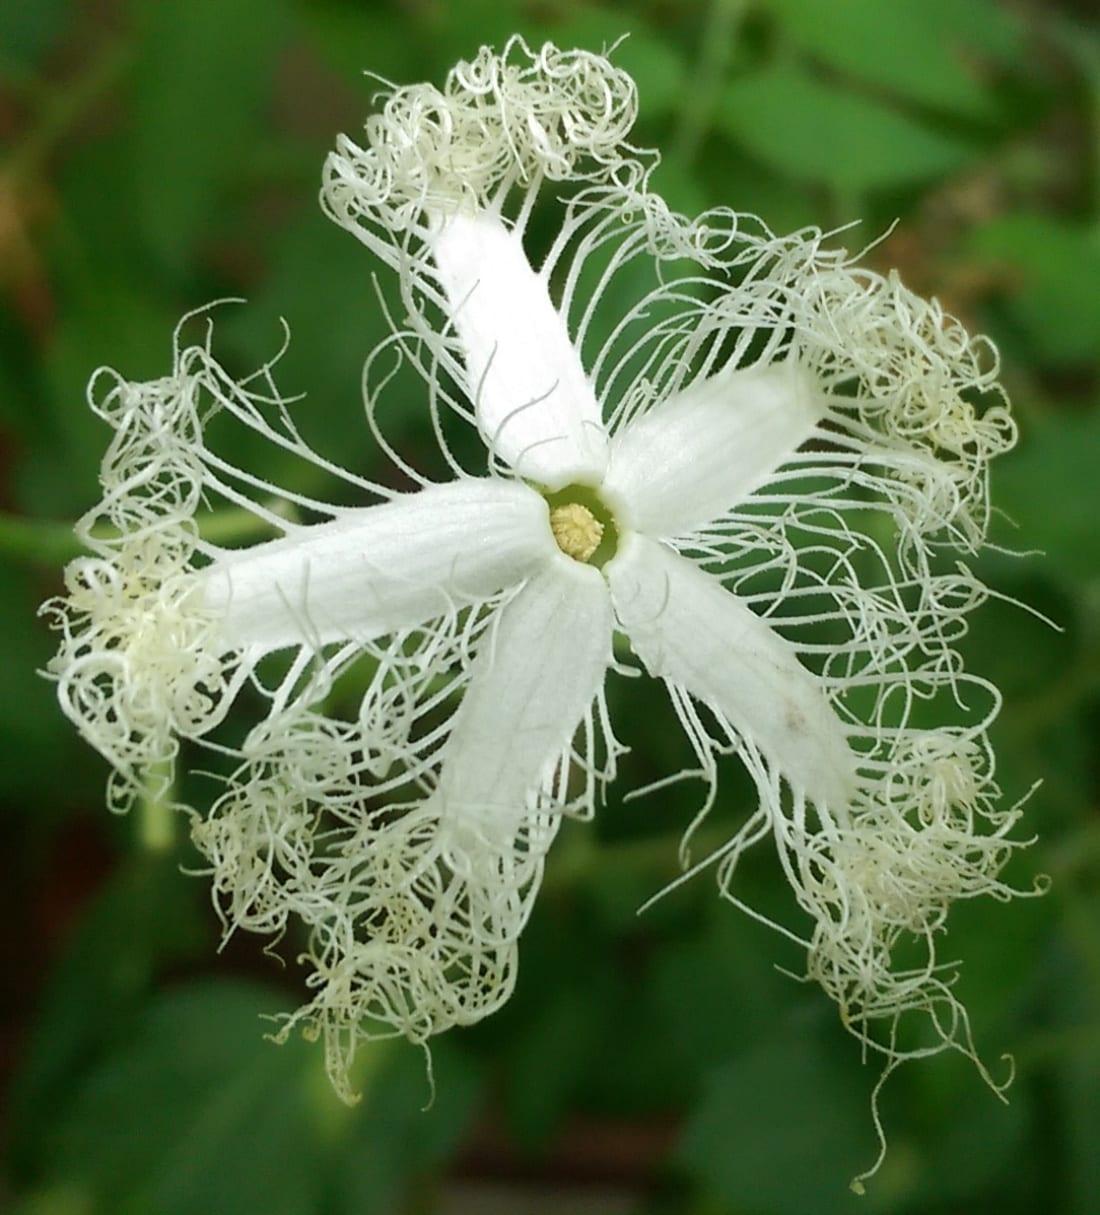 Slangkalebas - bloem 1100x1215